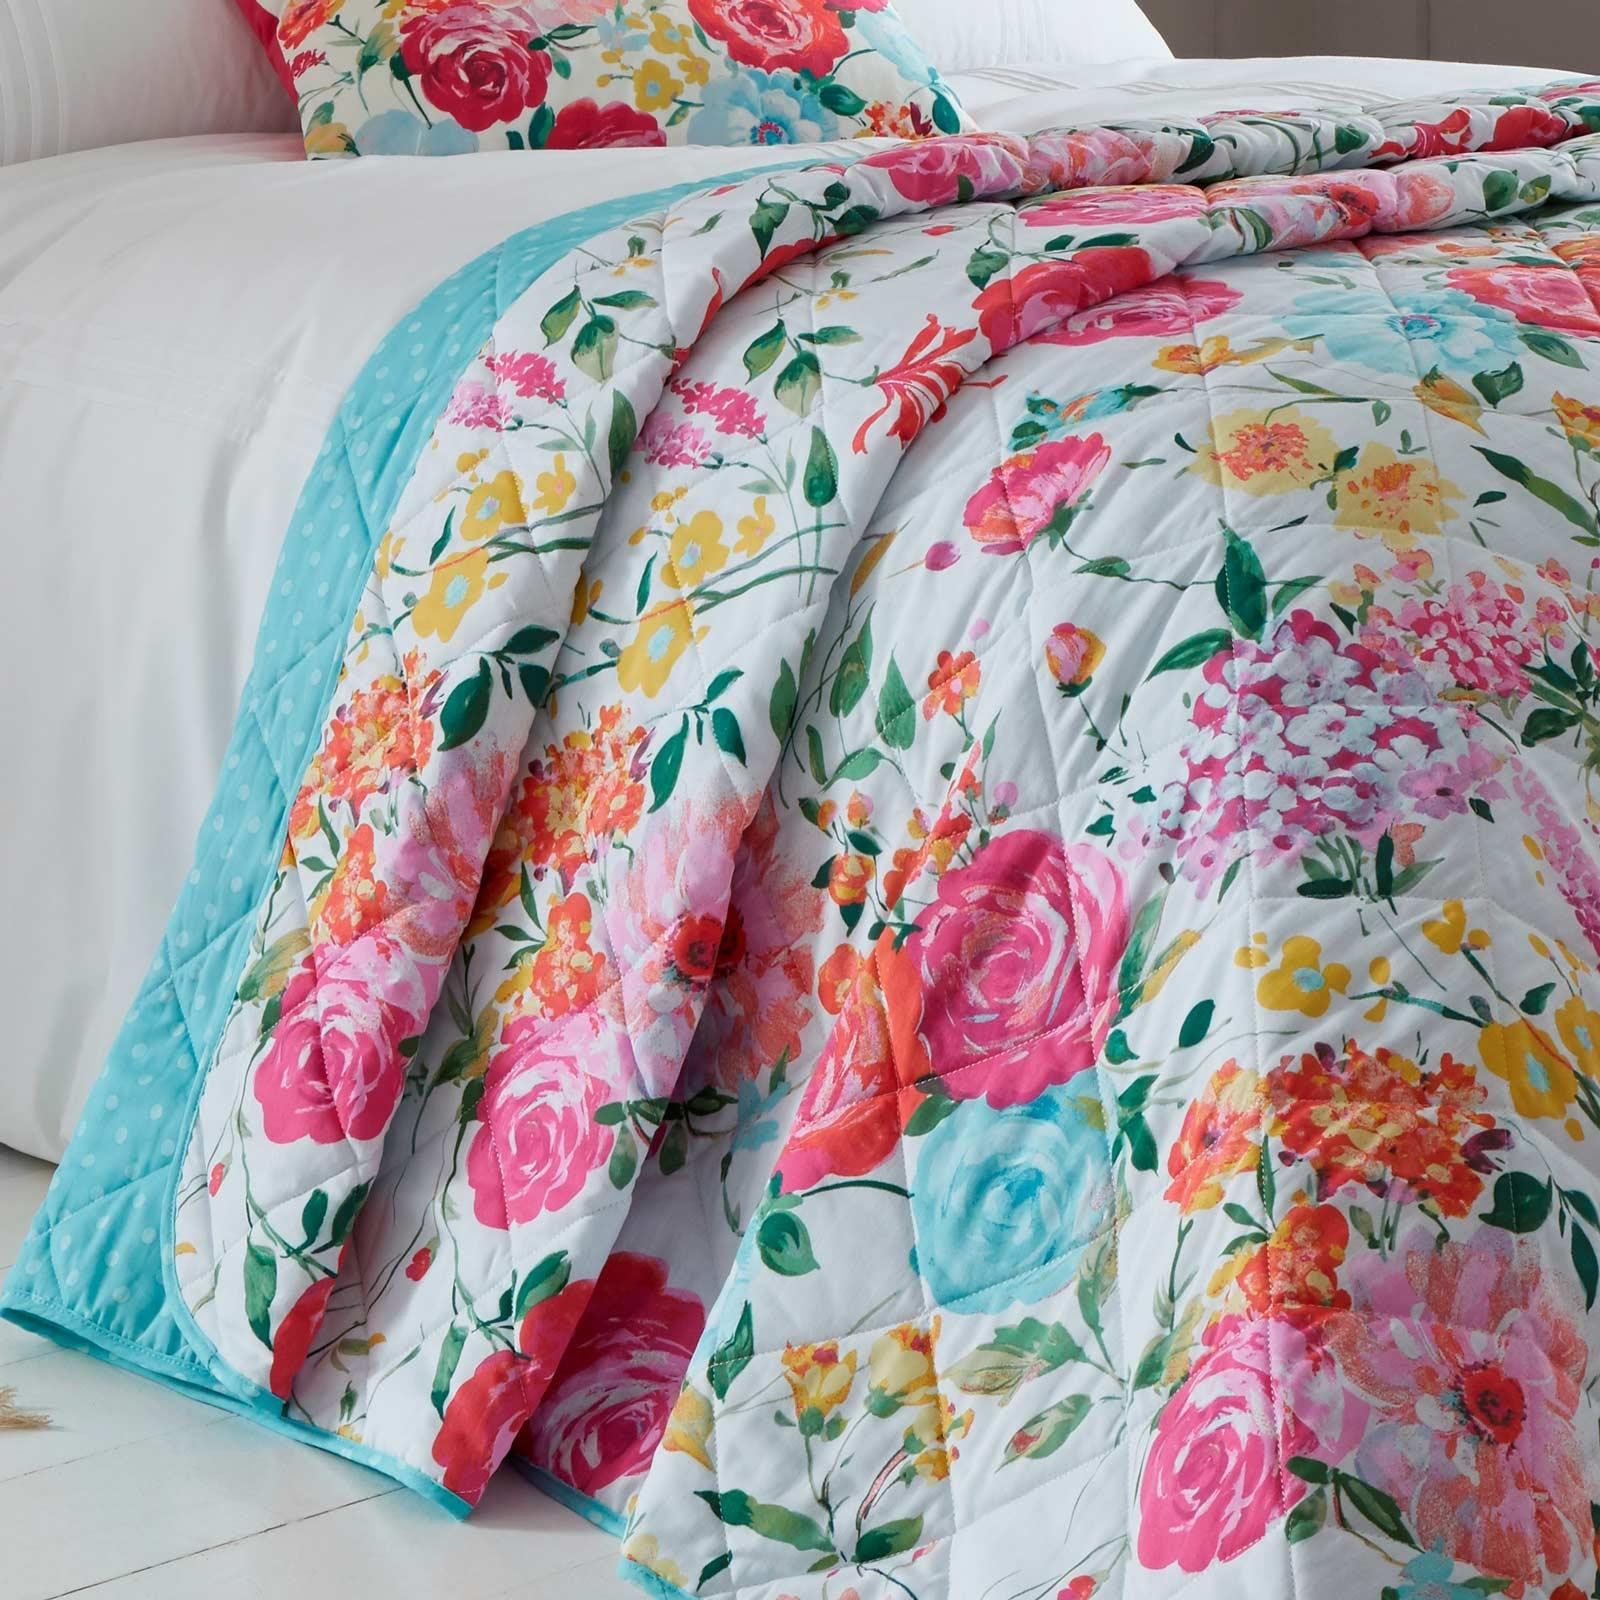 Catherine-Lansfield-Salisbury-Pink-cubierta-del-edredon-edredon-cubre-floral-de-conjuntos-de-cama miniatura 20